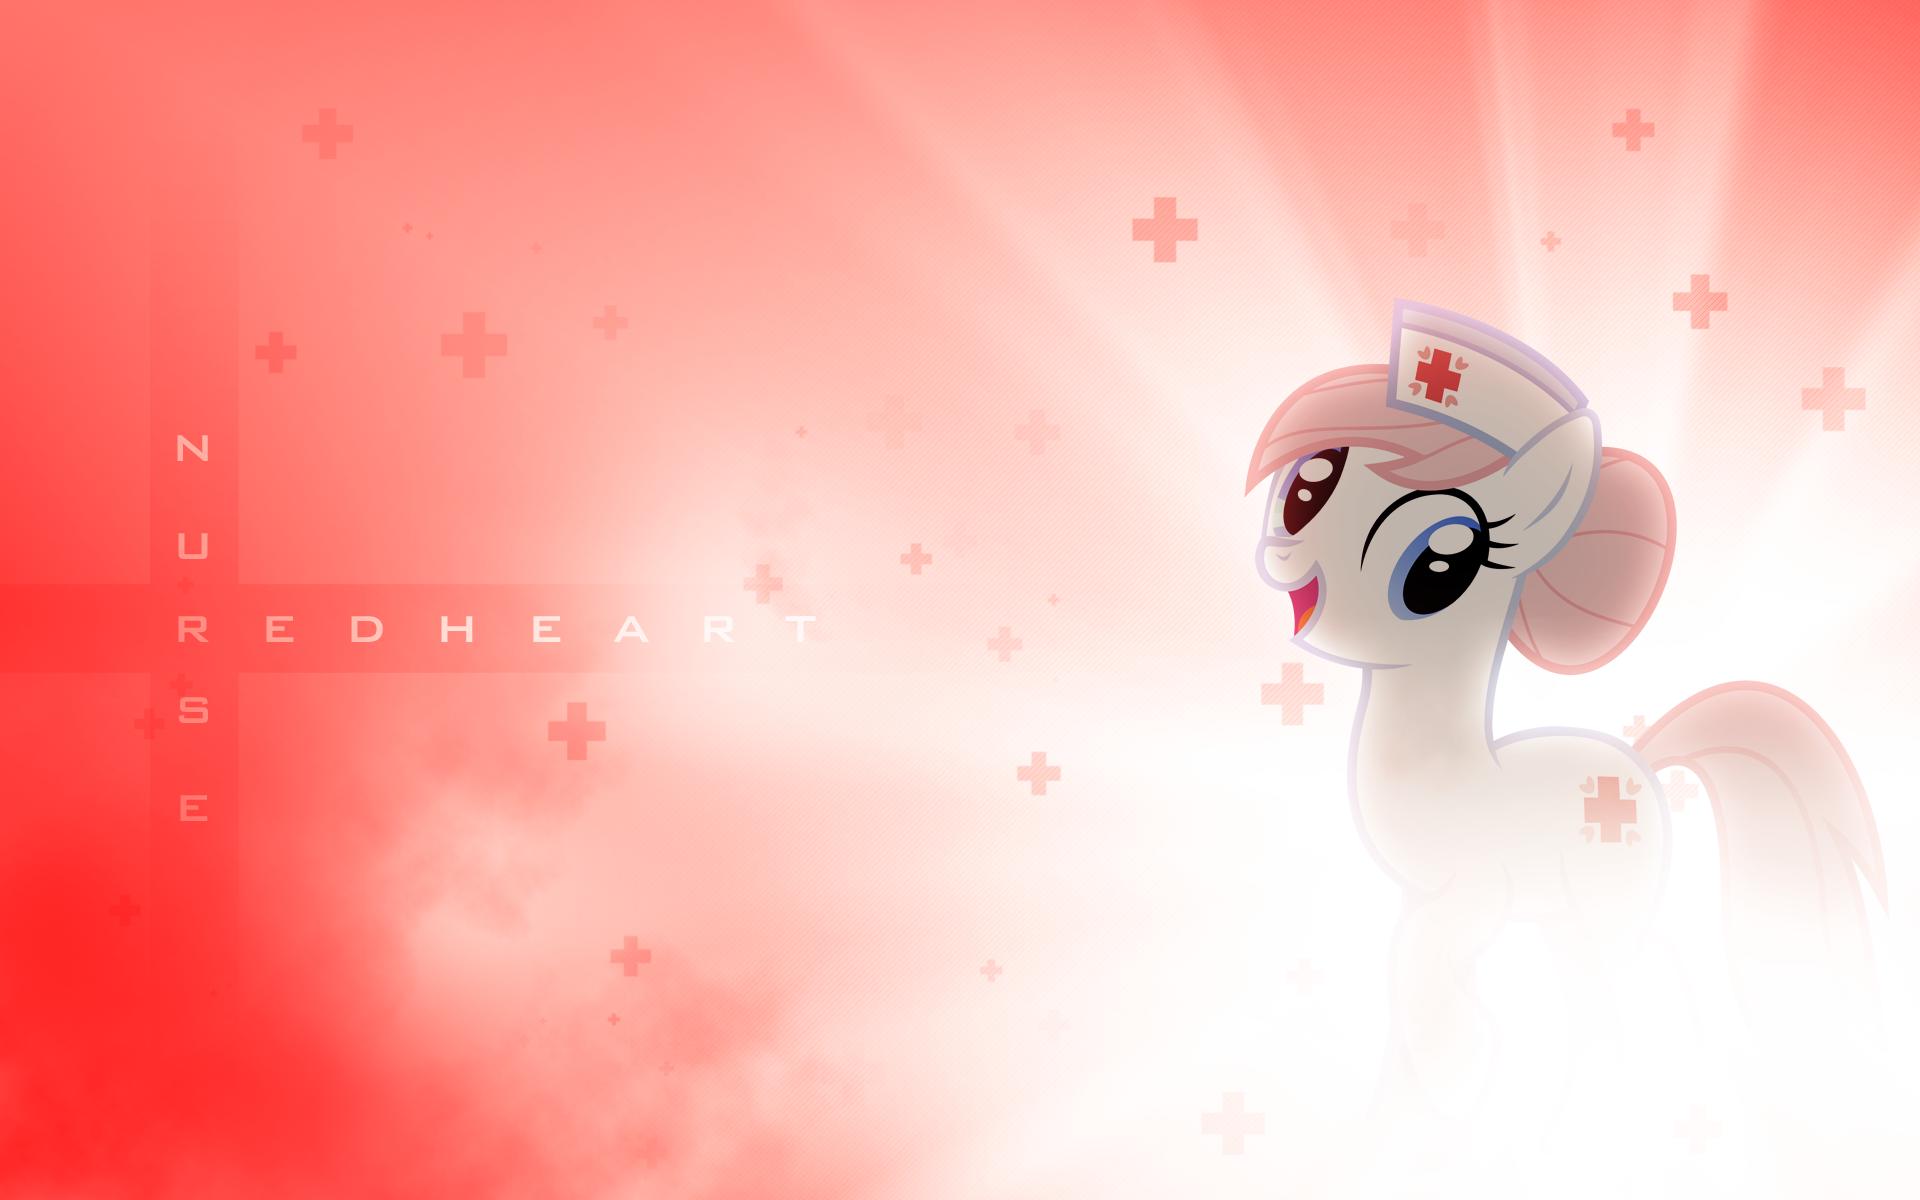 Nurse Redheart by DrFatalChunk and Vexx3